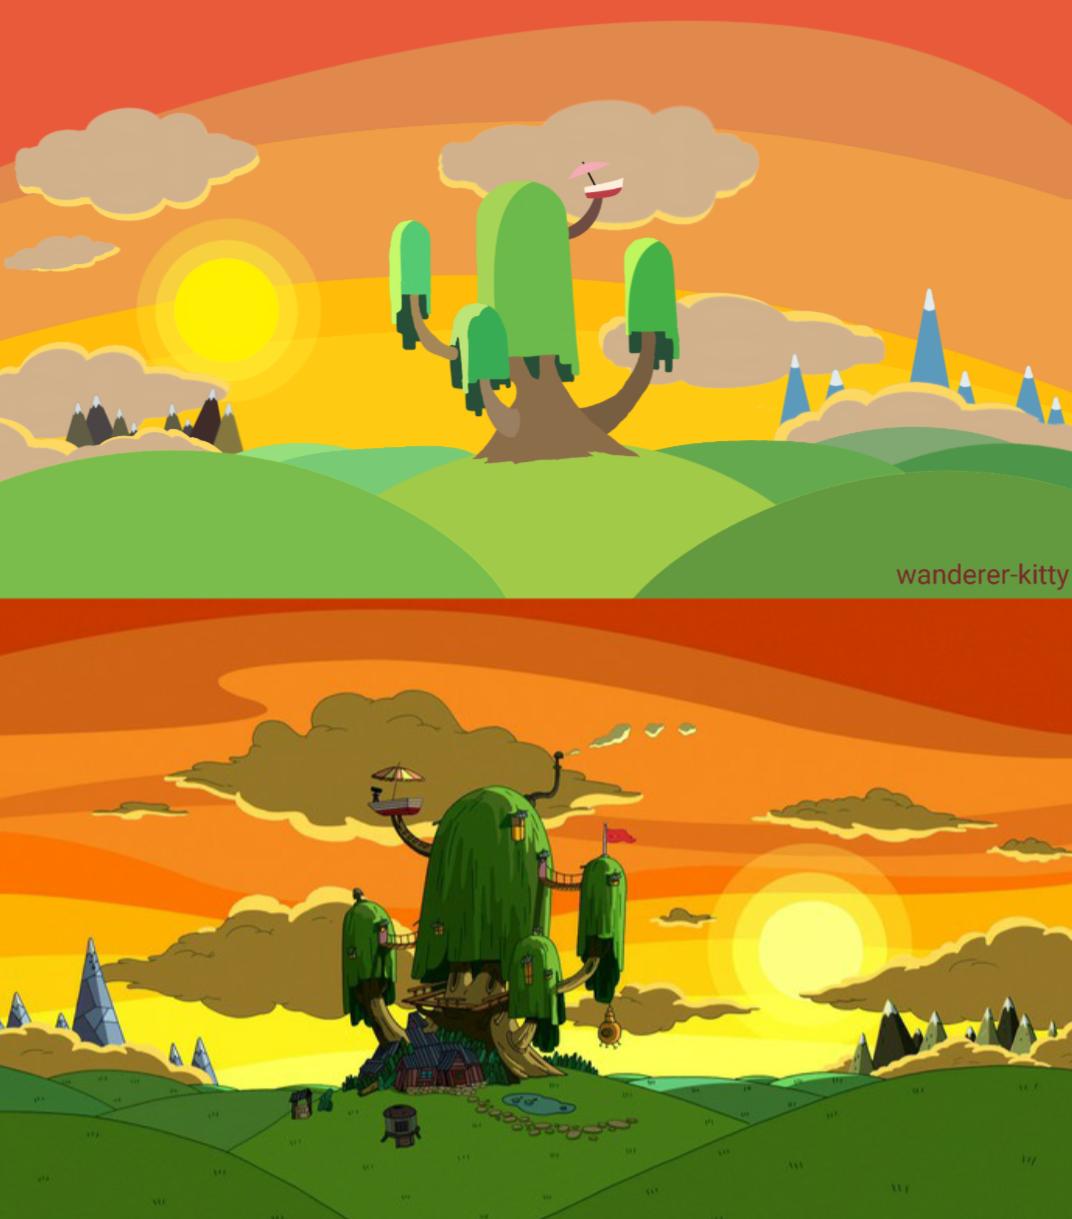 Adventure Time Vector Landscape By Wanderer Kitty On Deviantart